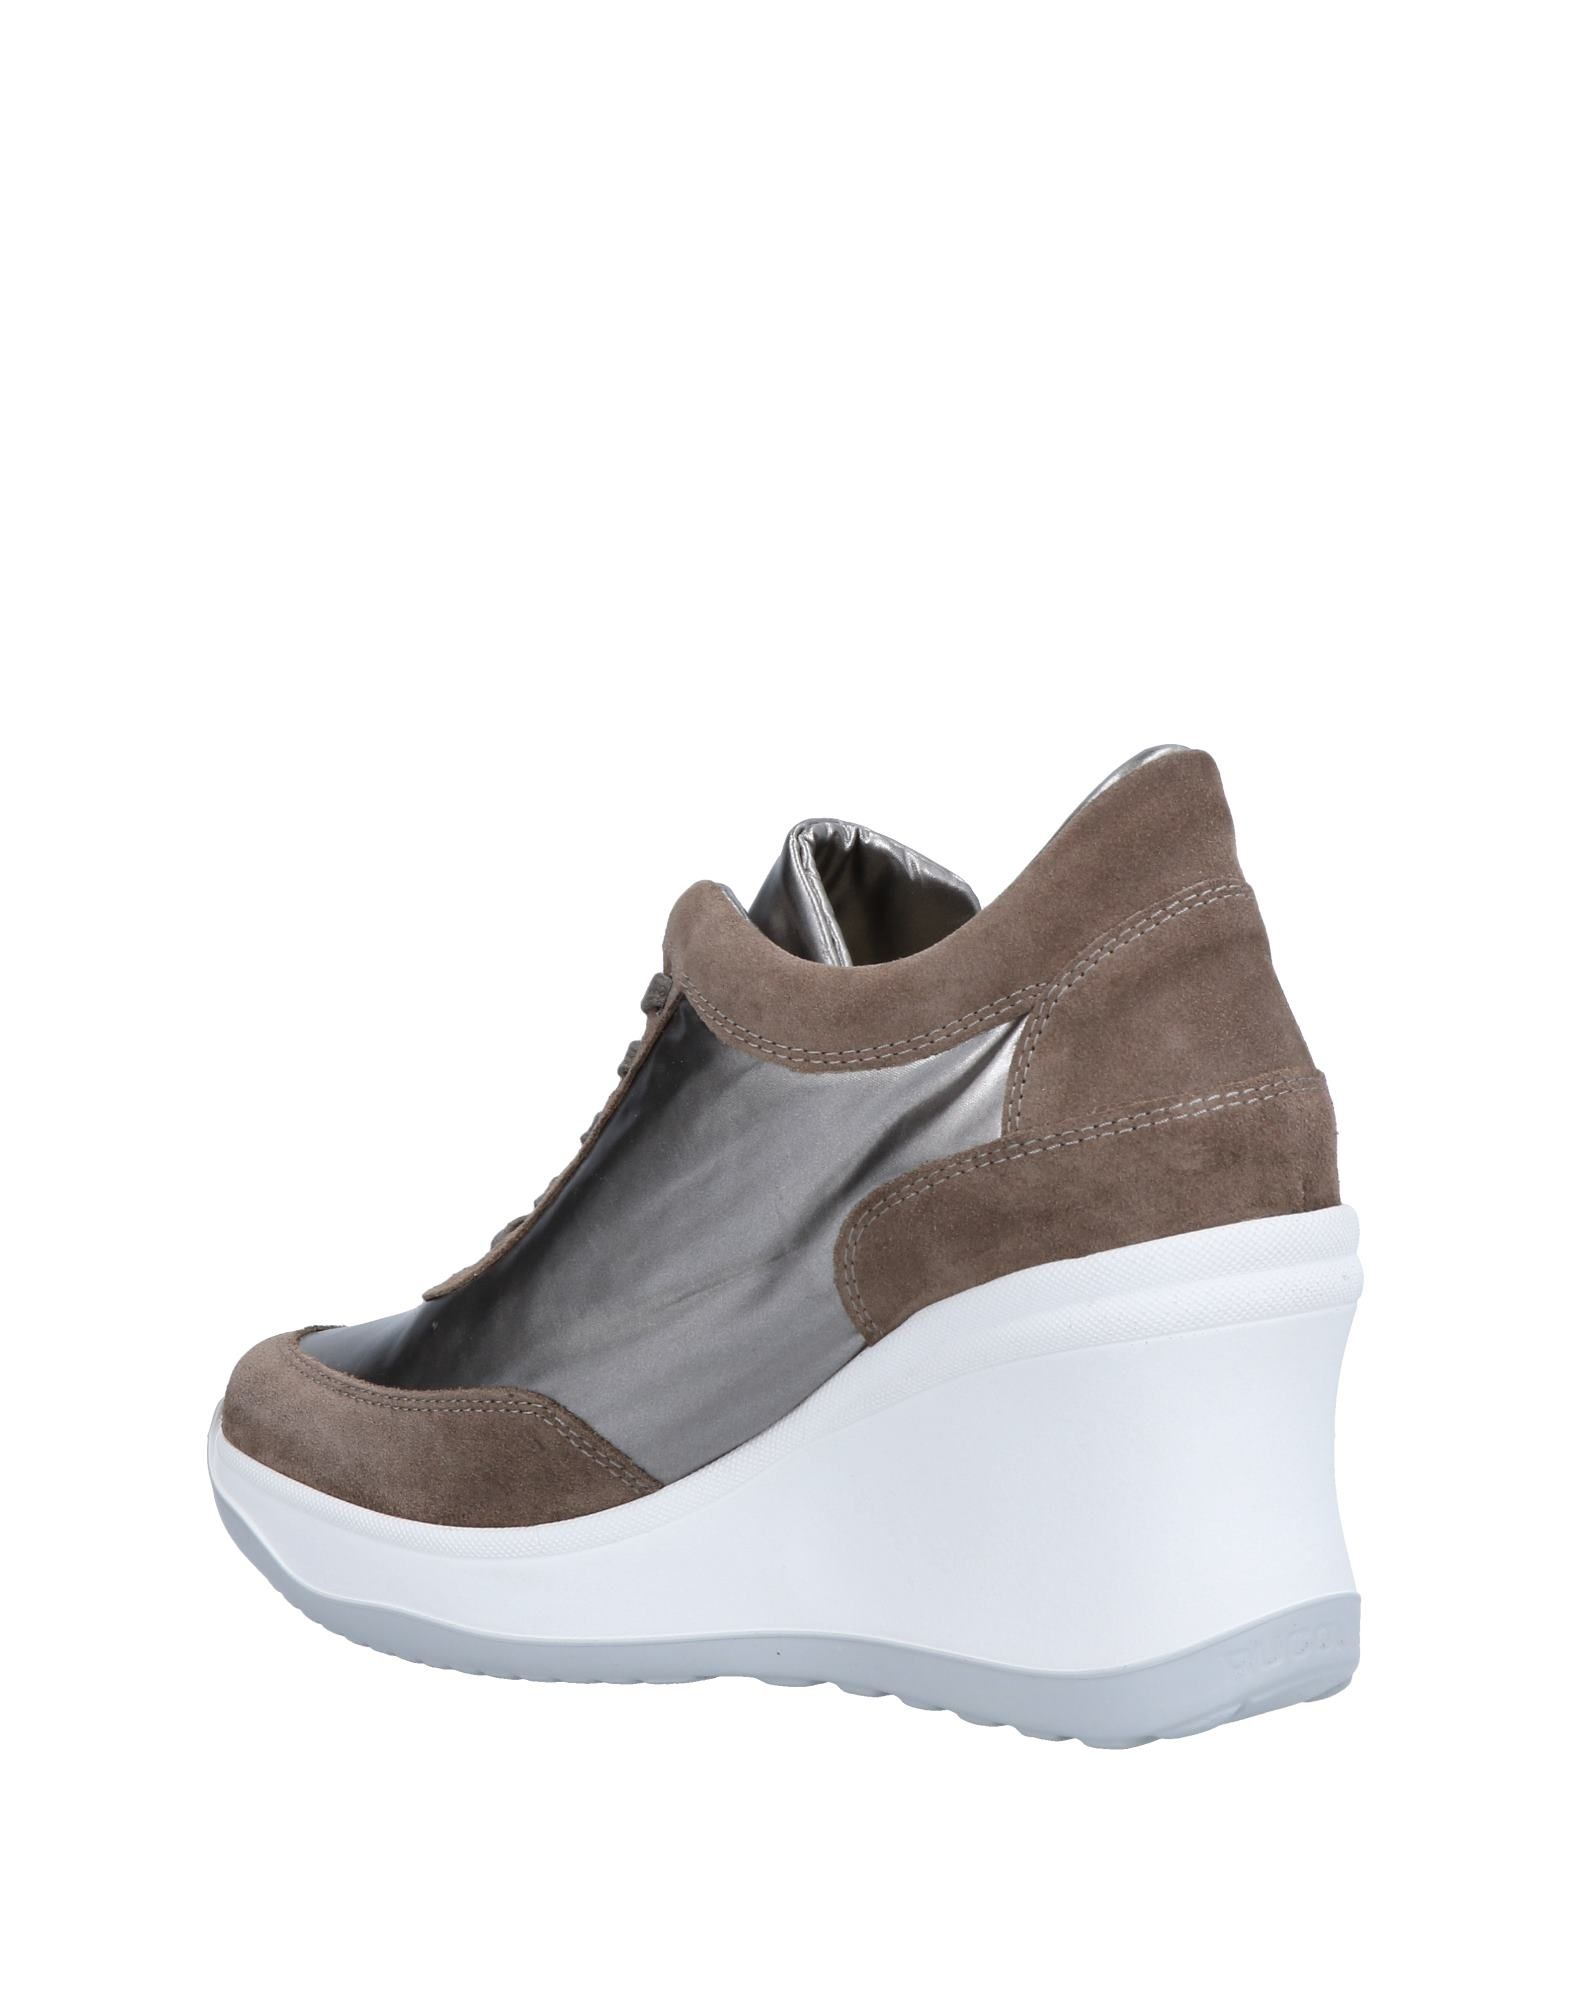 Agile By Rucoline Sneakers - Women Agile Agile Agile By Rucoline Sneakers online on  United Kingdom - 11496596SO a043ab